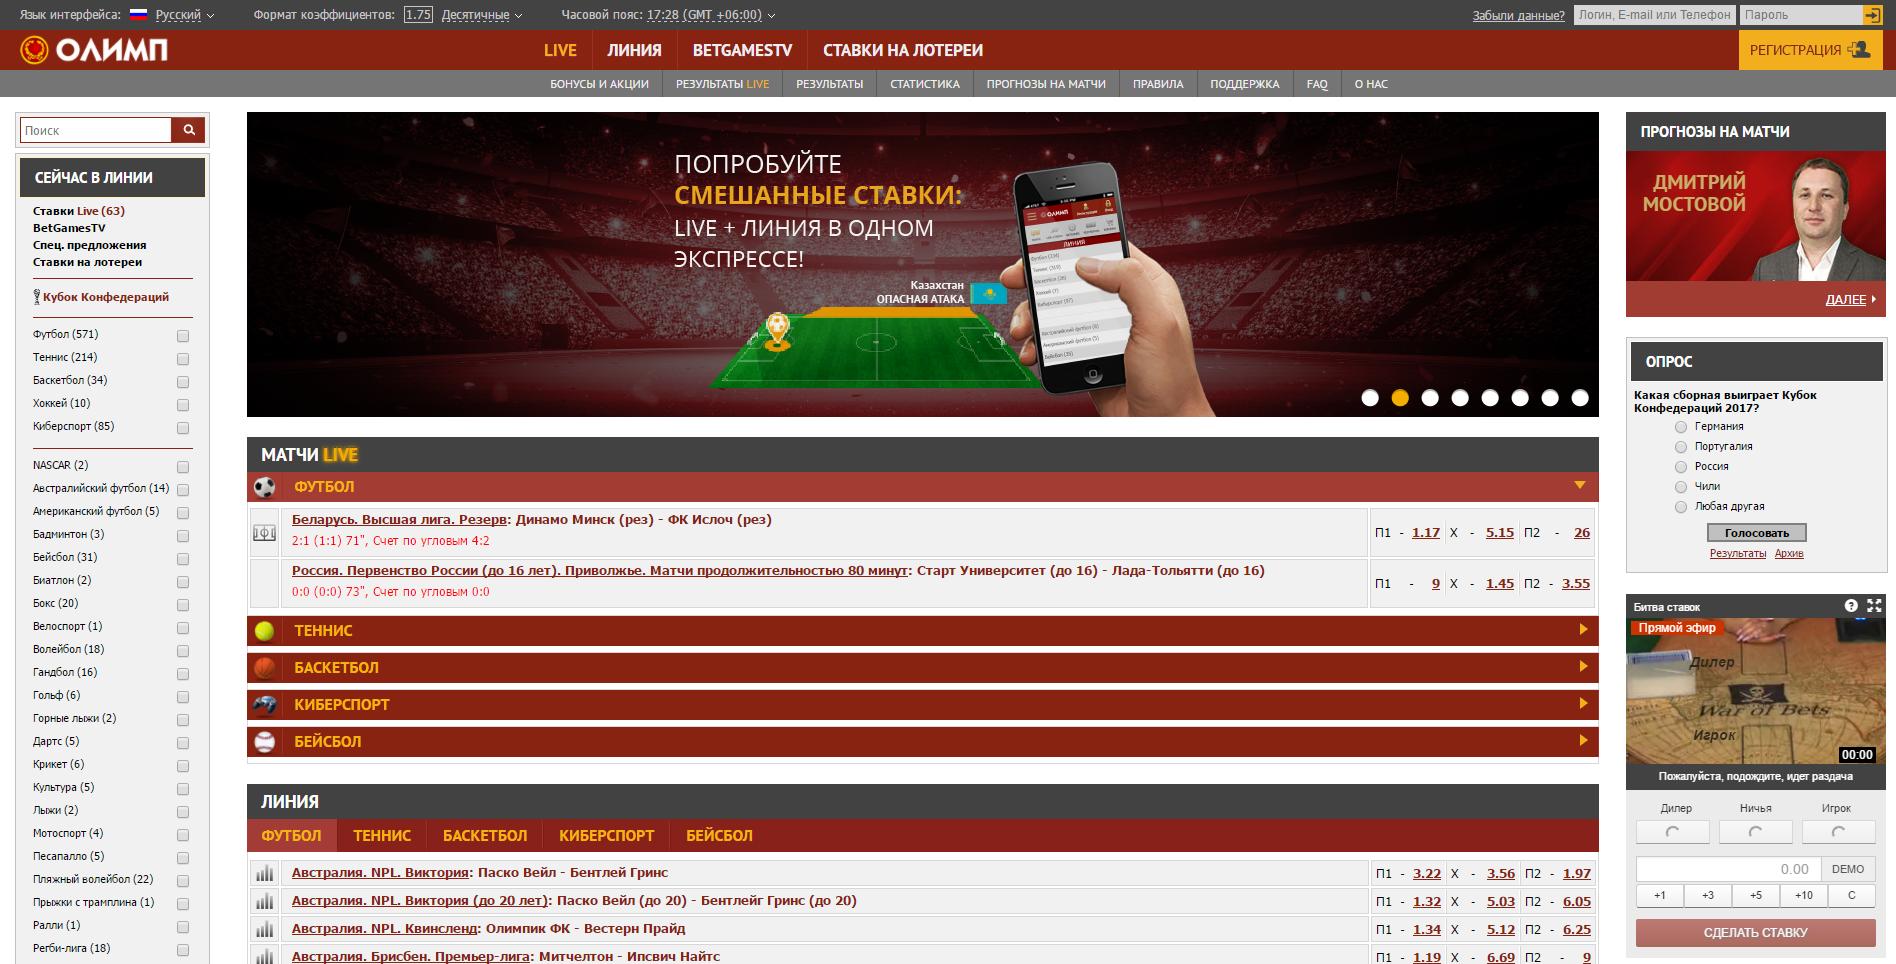 Сайт БК Олимп